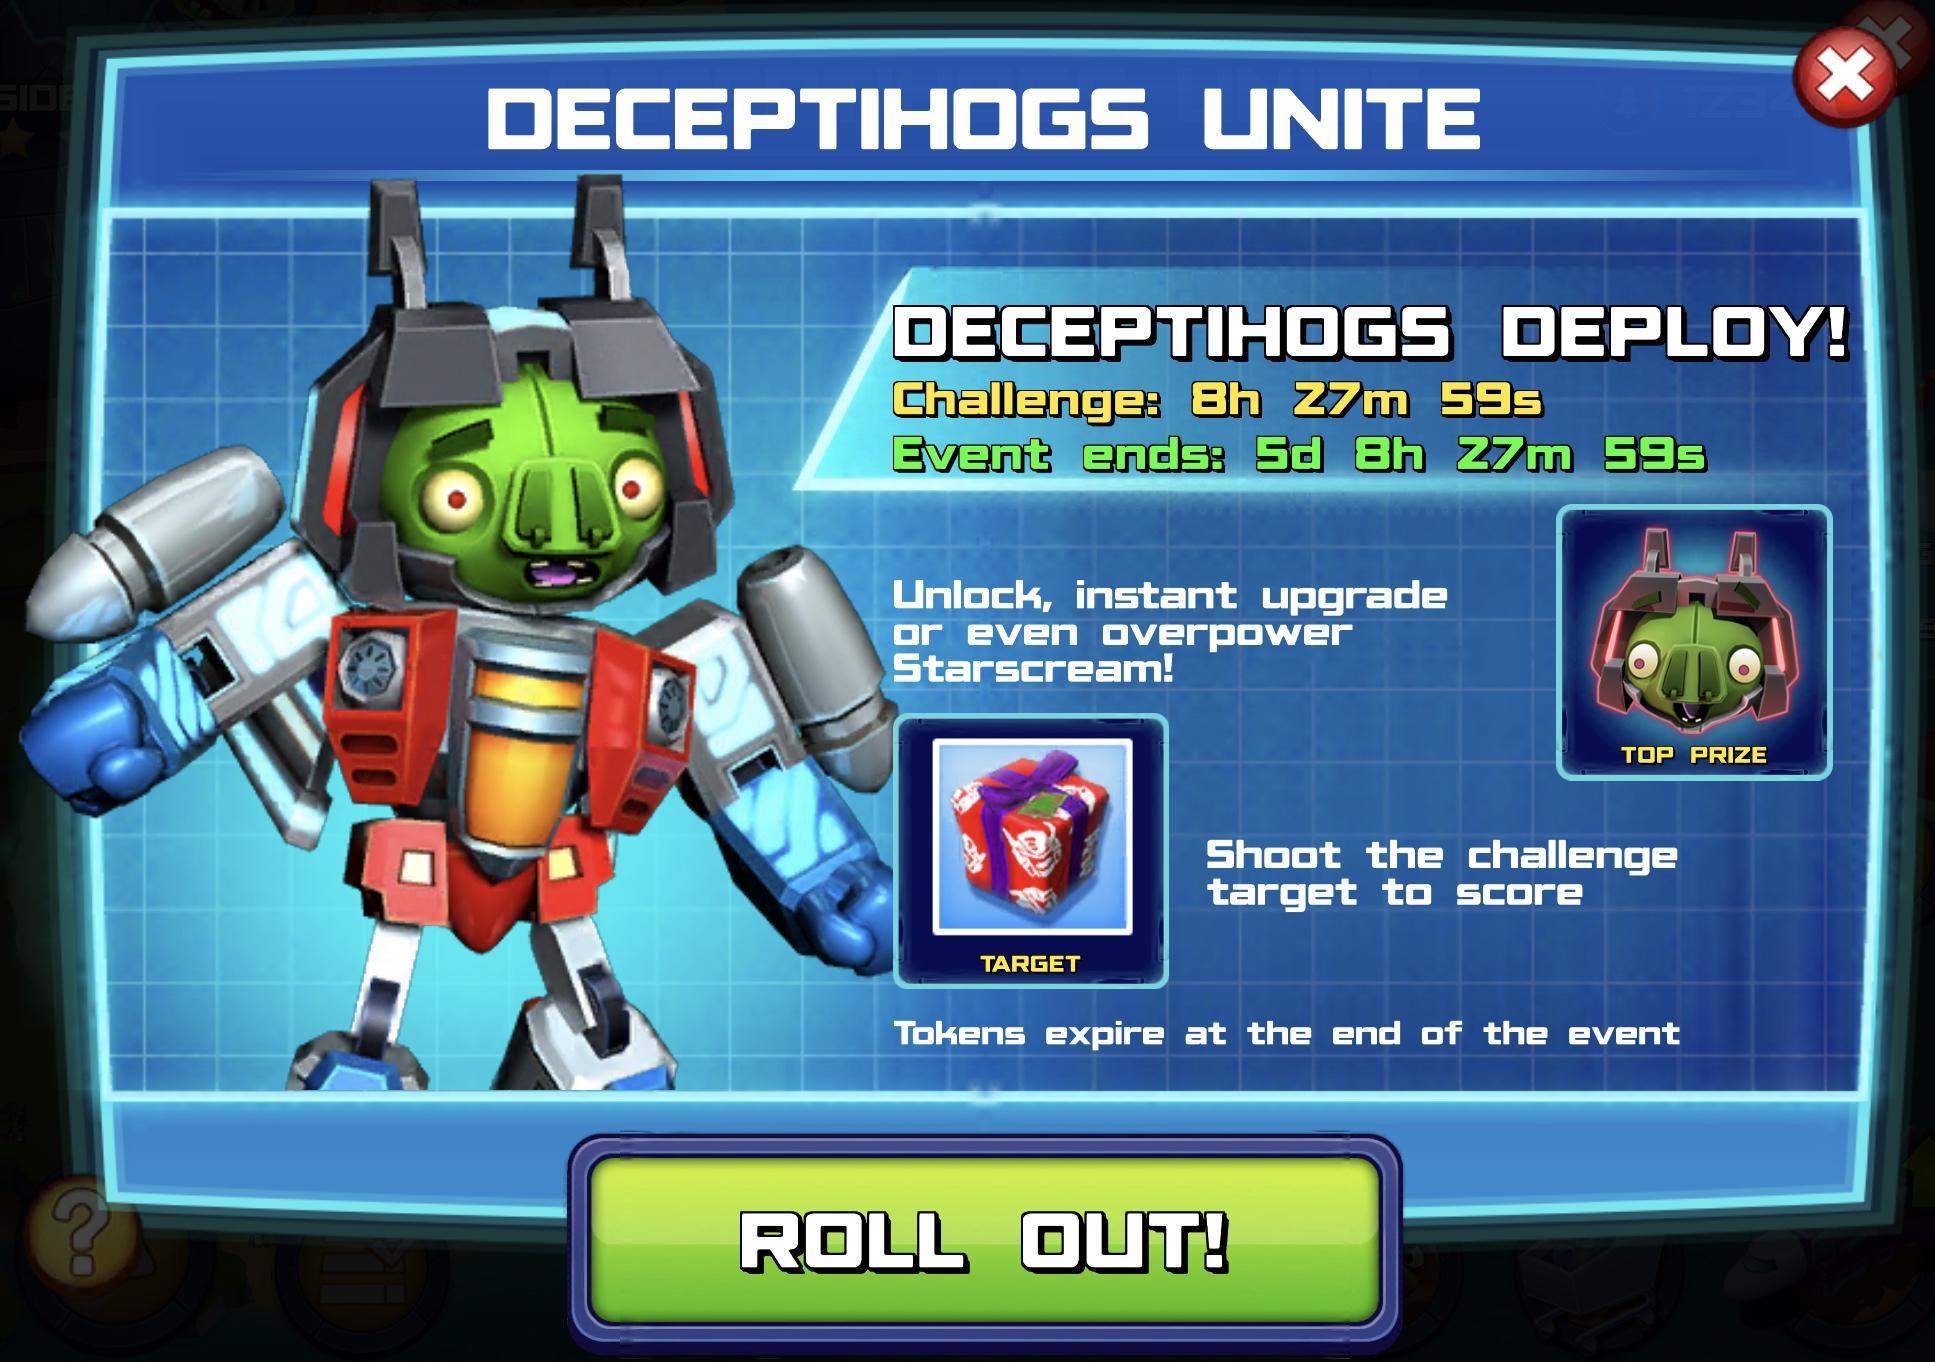 Deceptihogs Deploy event banner